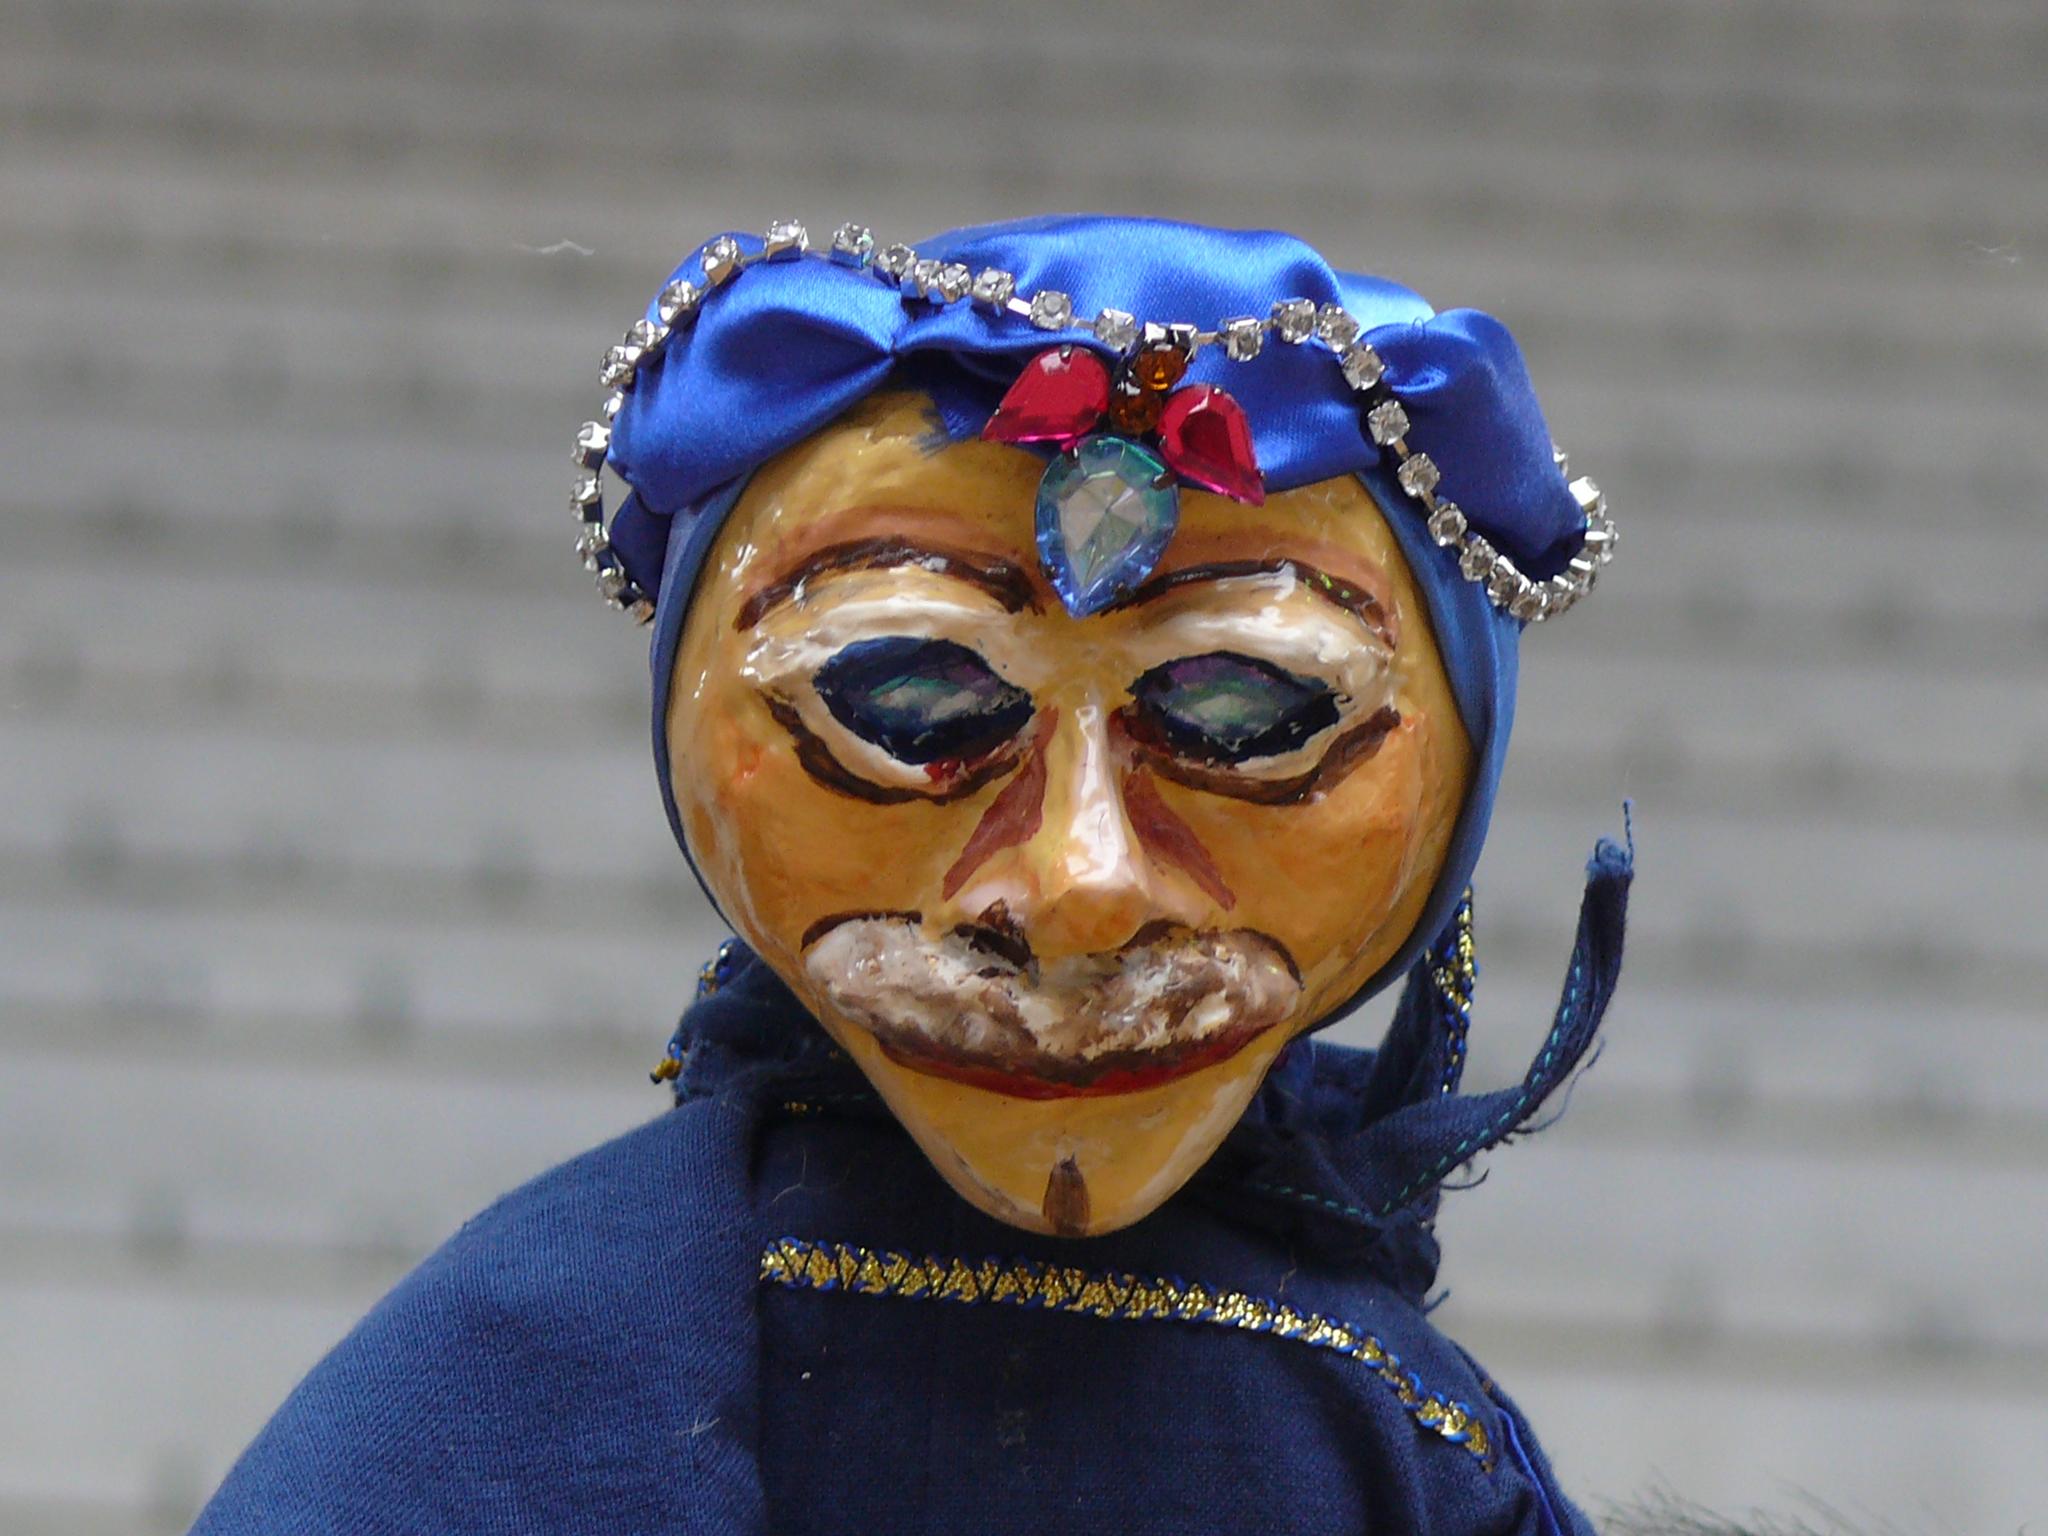 Exposición exposición Marionetas del Mundo